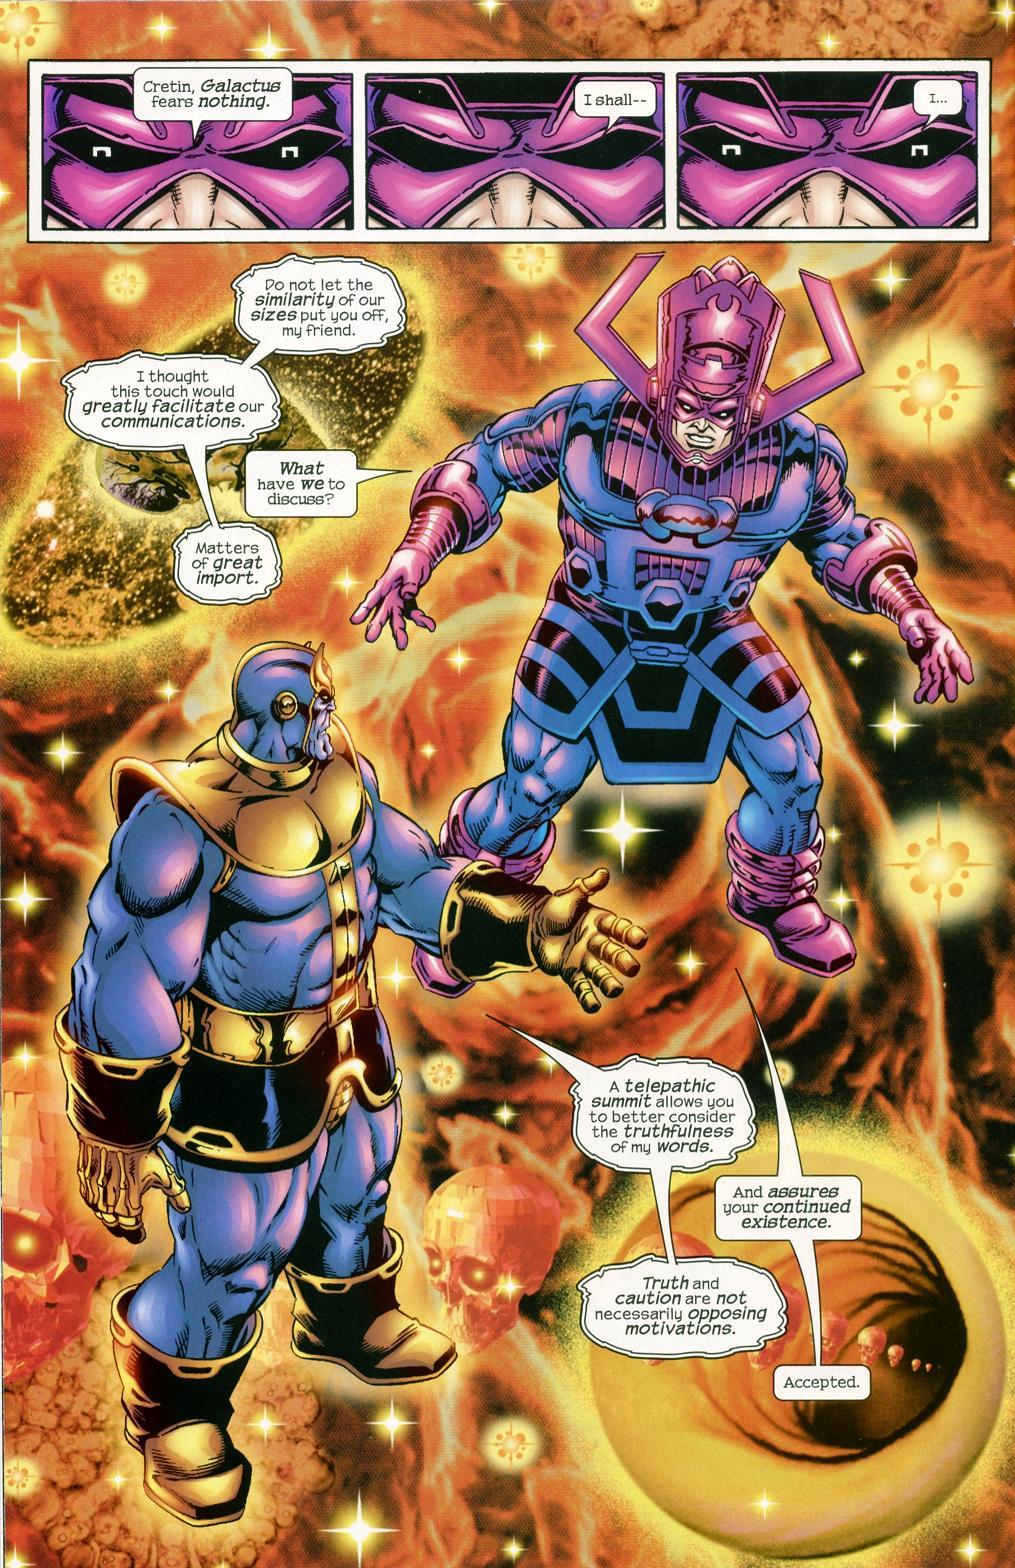 galactus vs thanos - photo #4